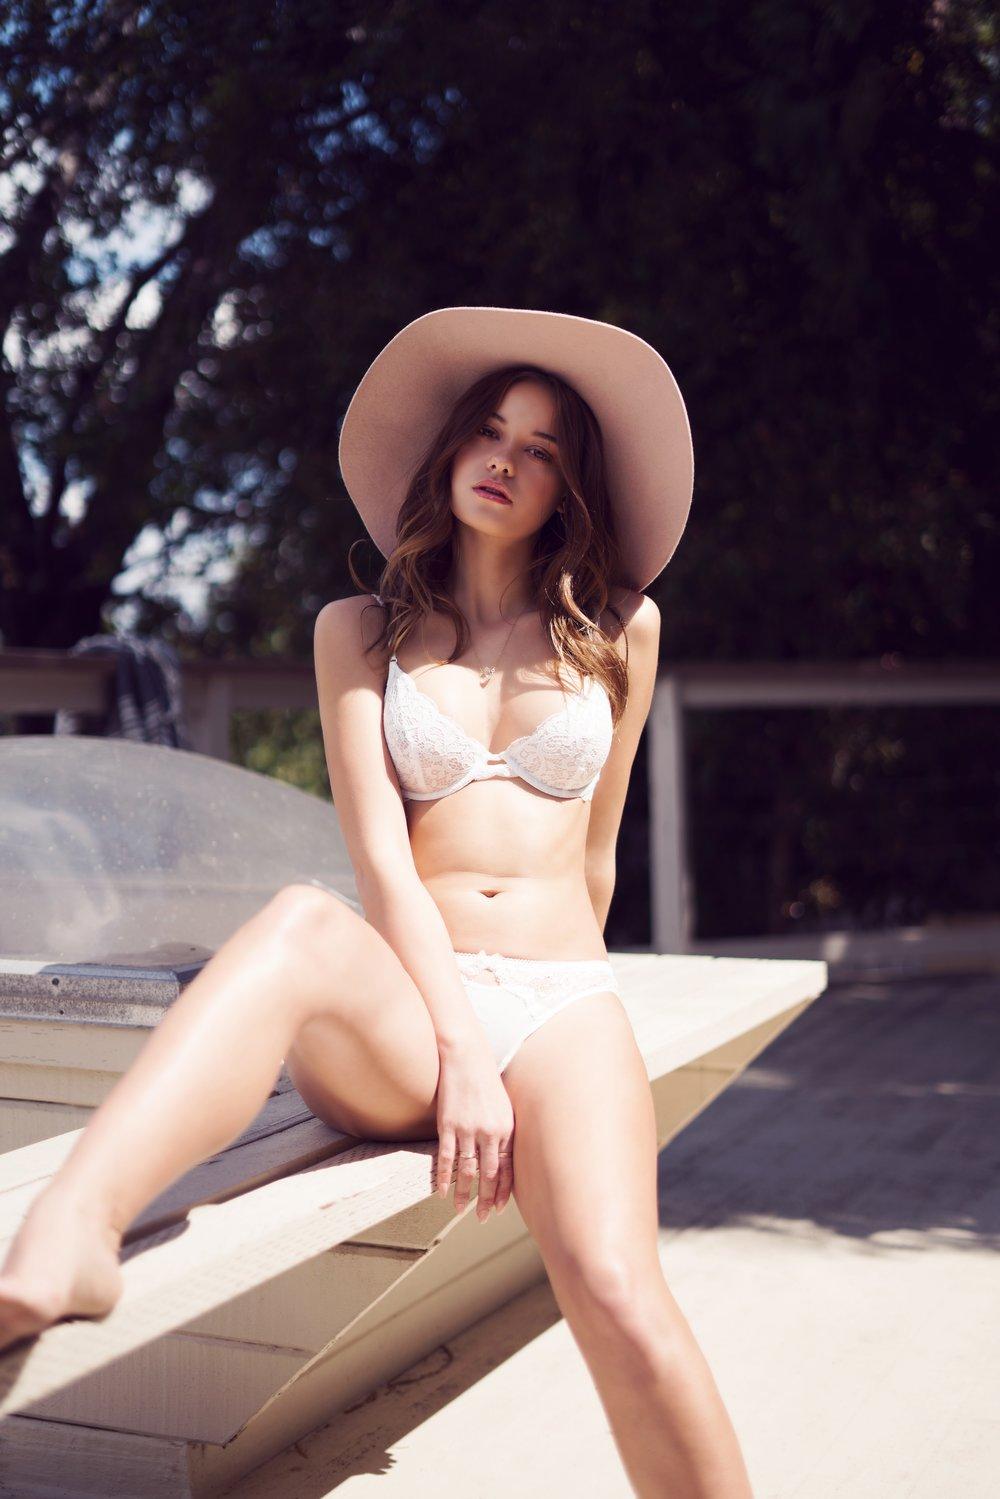 How to shoot lingerie models